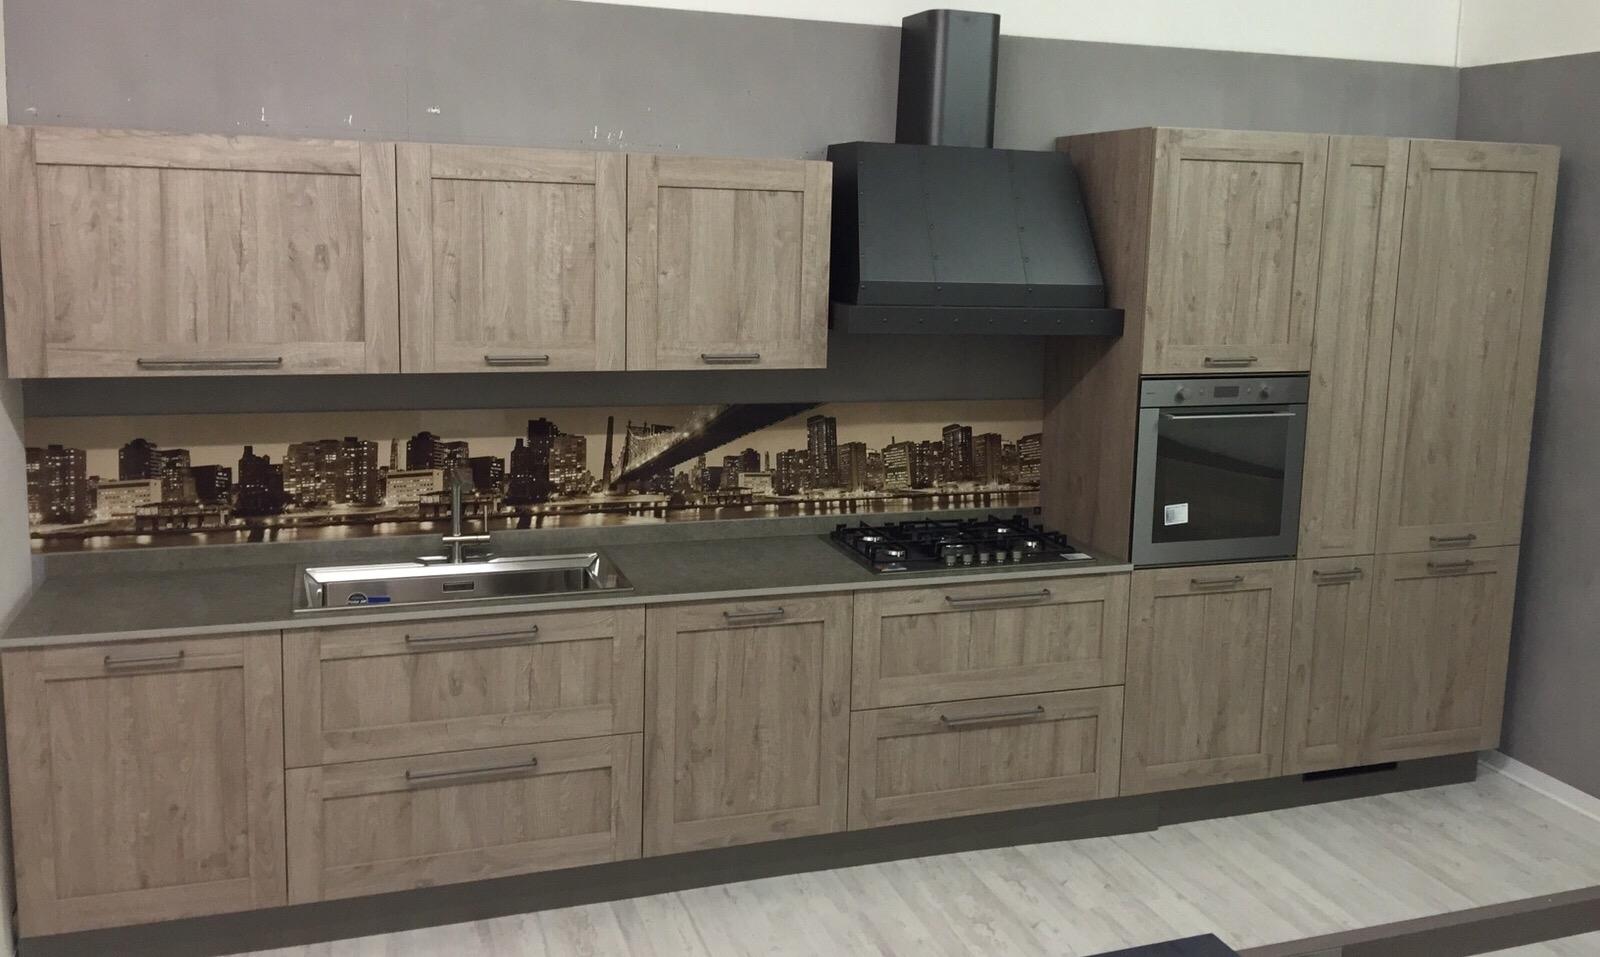 Cucina lineare stosa vintage modello city completa di - Cucina city stosa ...